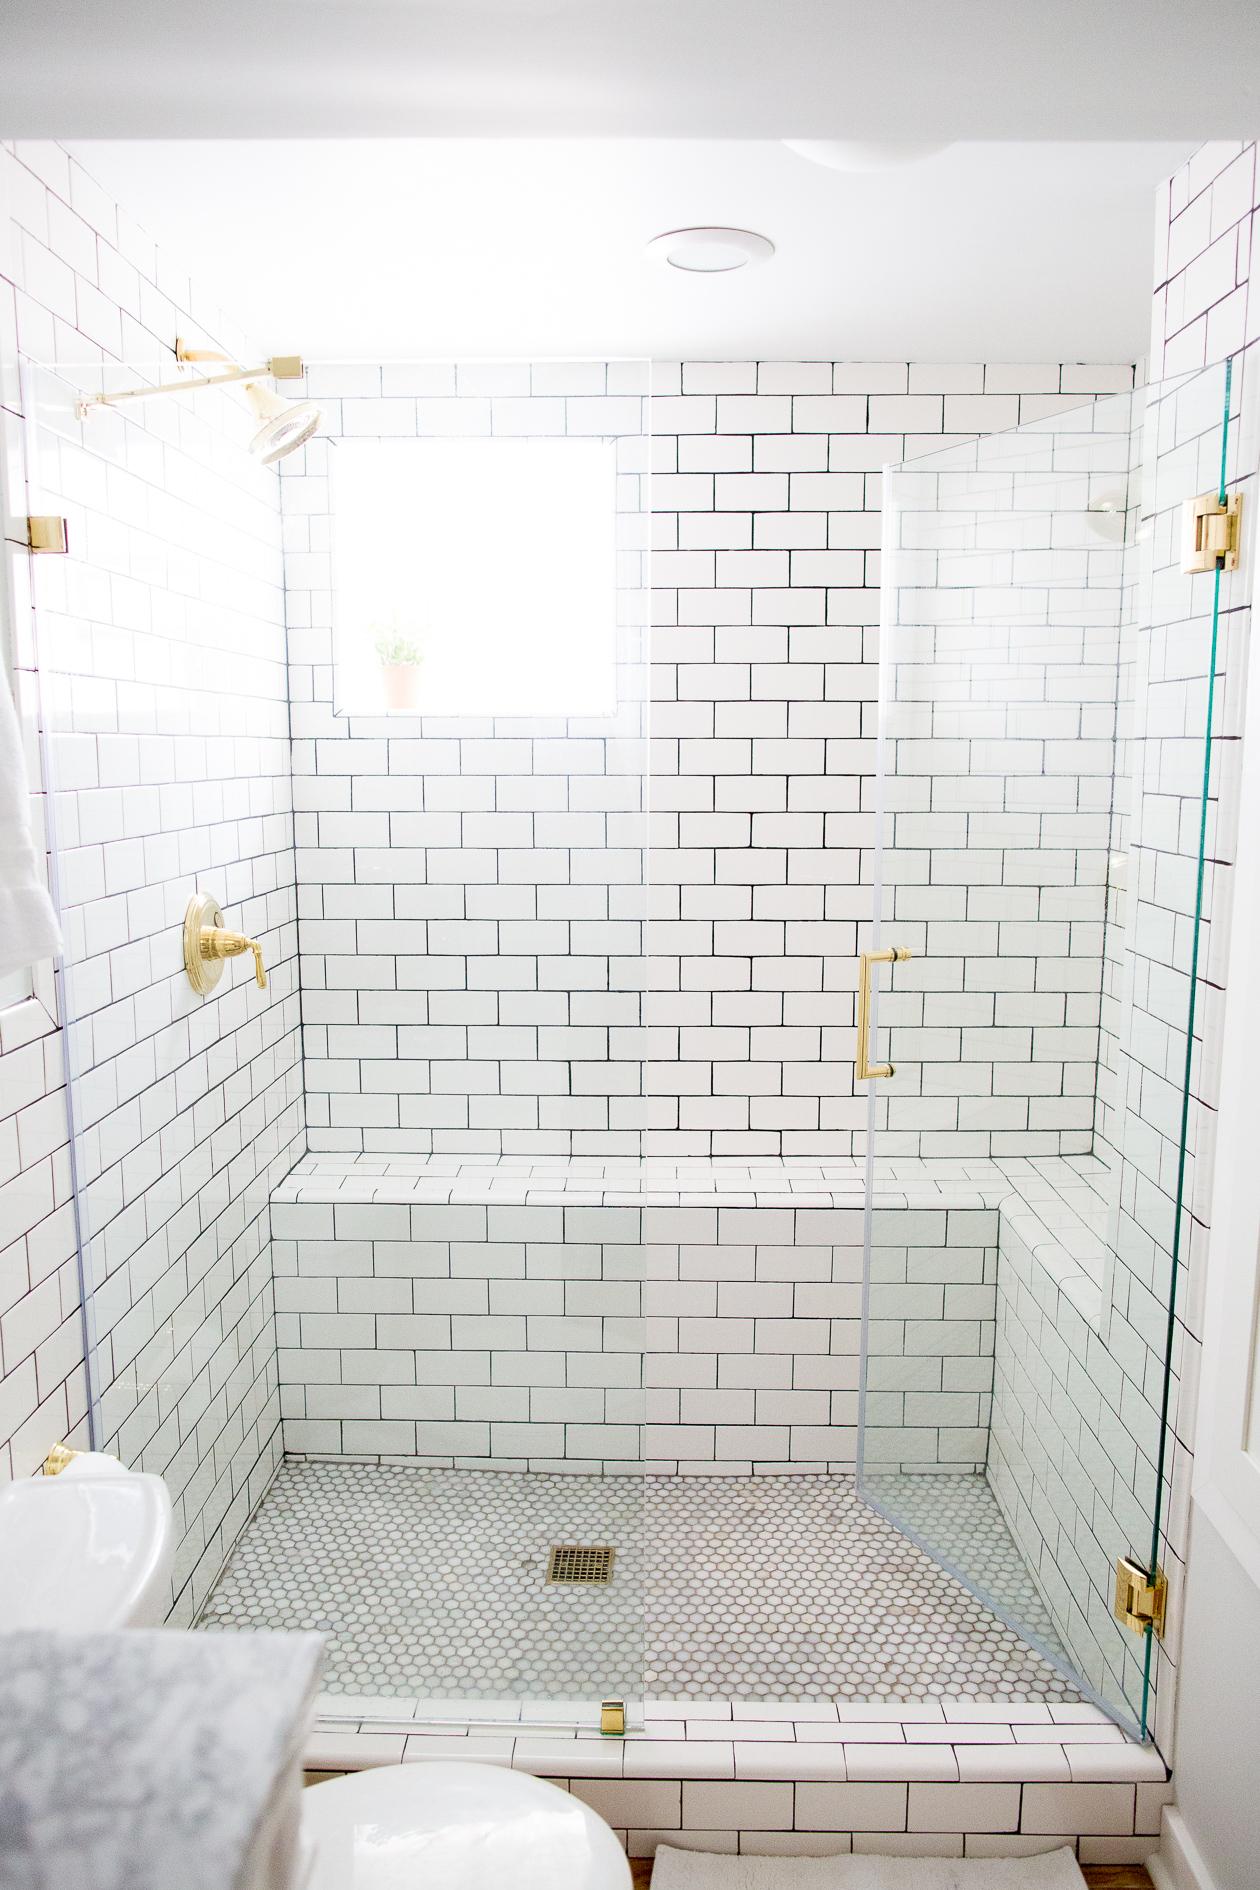 Kelly-in-the-City-Master-Bathroom-Renovation-77.jpg